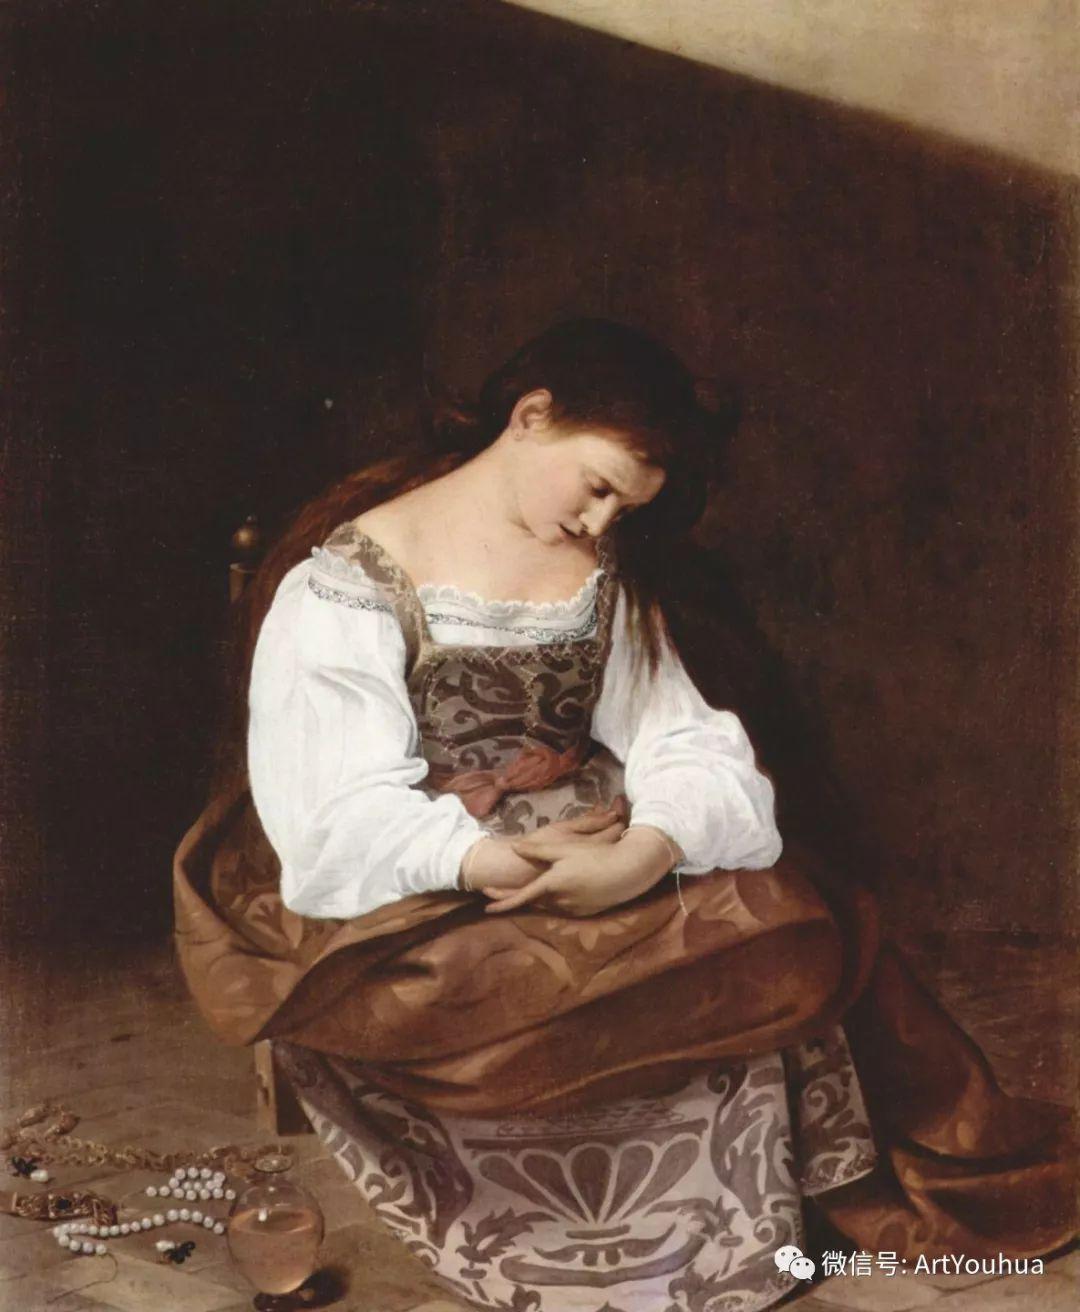 No.18 卡拉瓦乔 | 意大利16世纪末至17世纪初的著名画家插图41